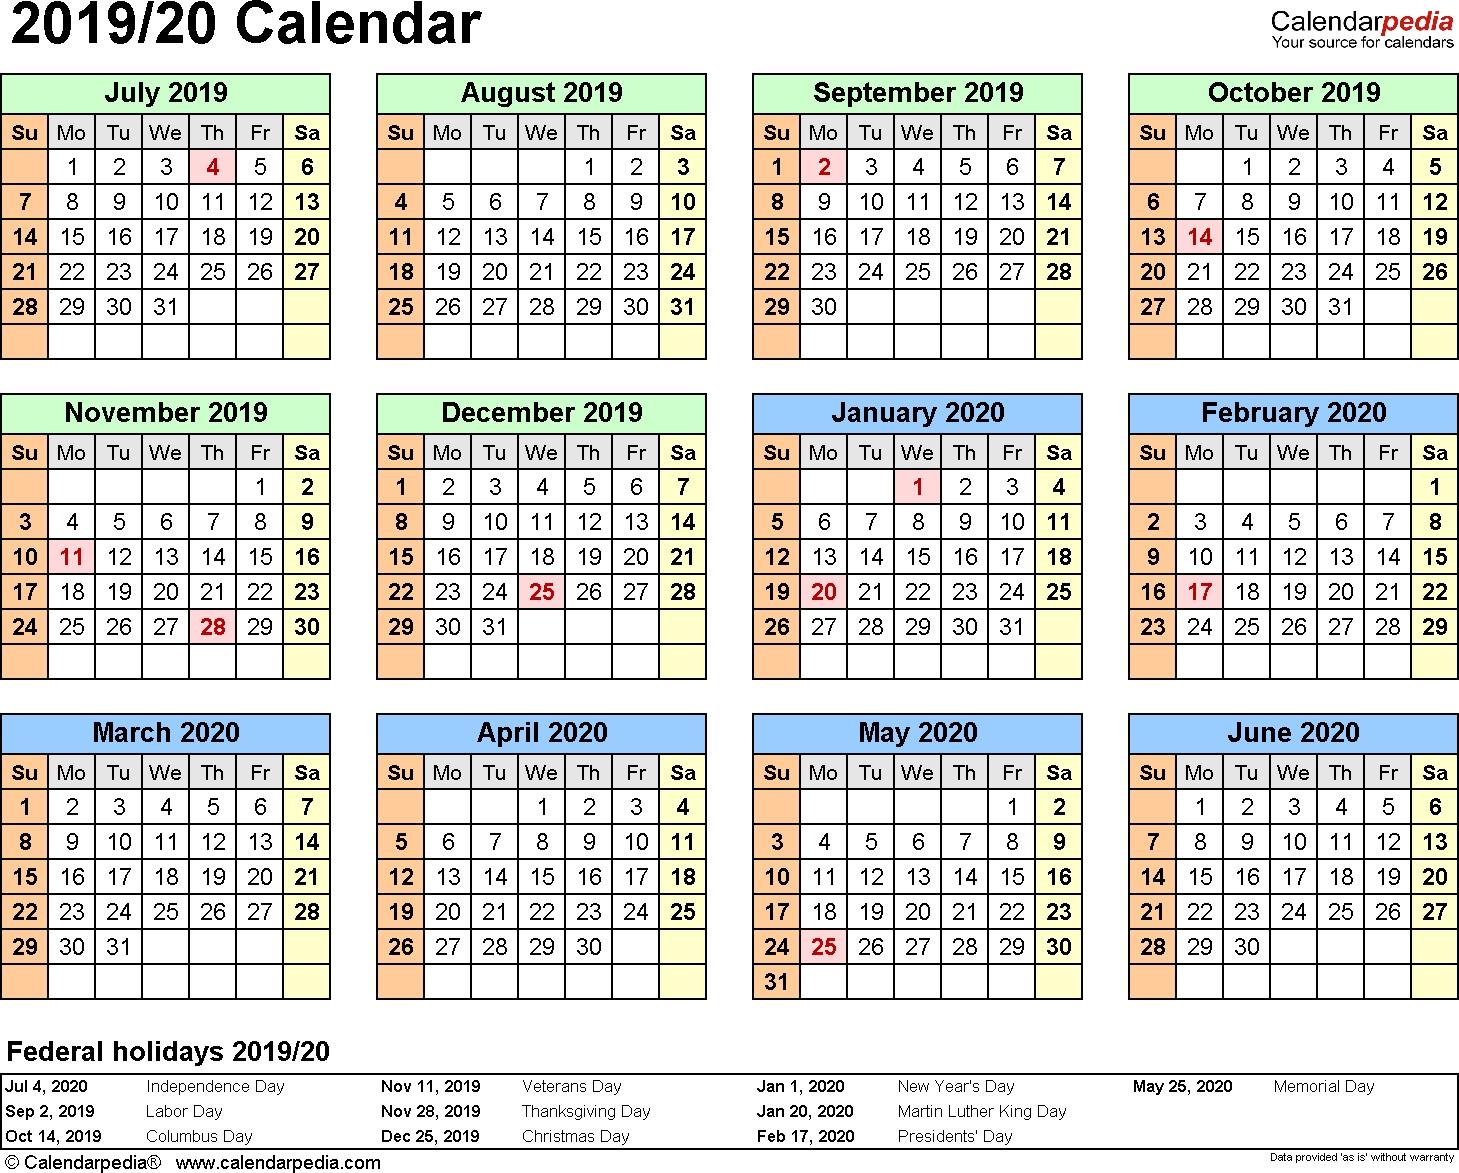 Australian Financial Year Calendar 2020 2010 - Template  Aus 2021-2021 Financial Year Period